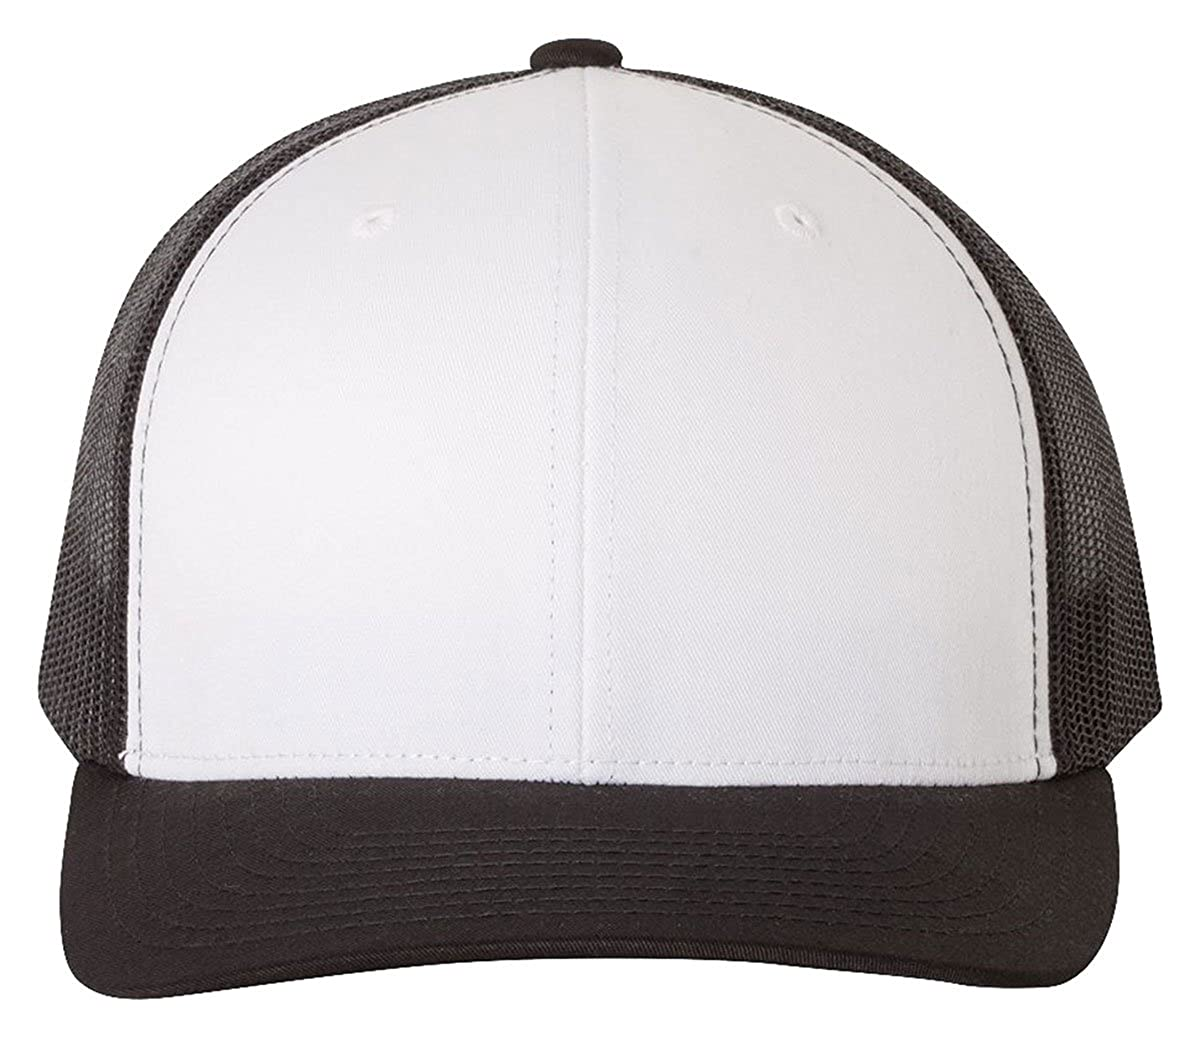 da989b811 Yupoong Retro Trucker Hat & 2-Tone Snapback - 6606, by Flexfit (One Size,  Black/White/Black)